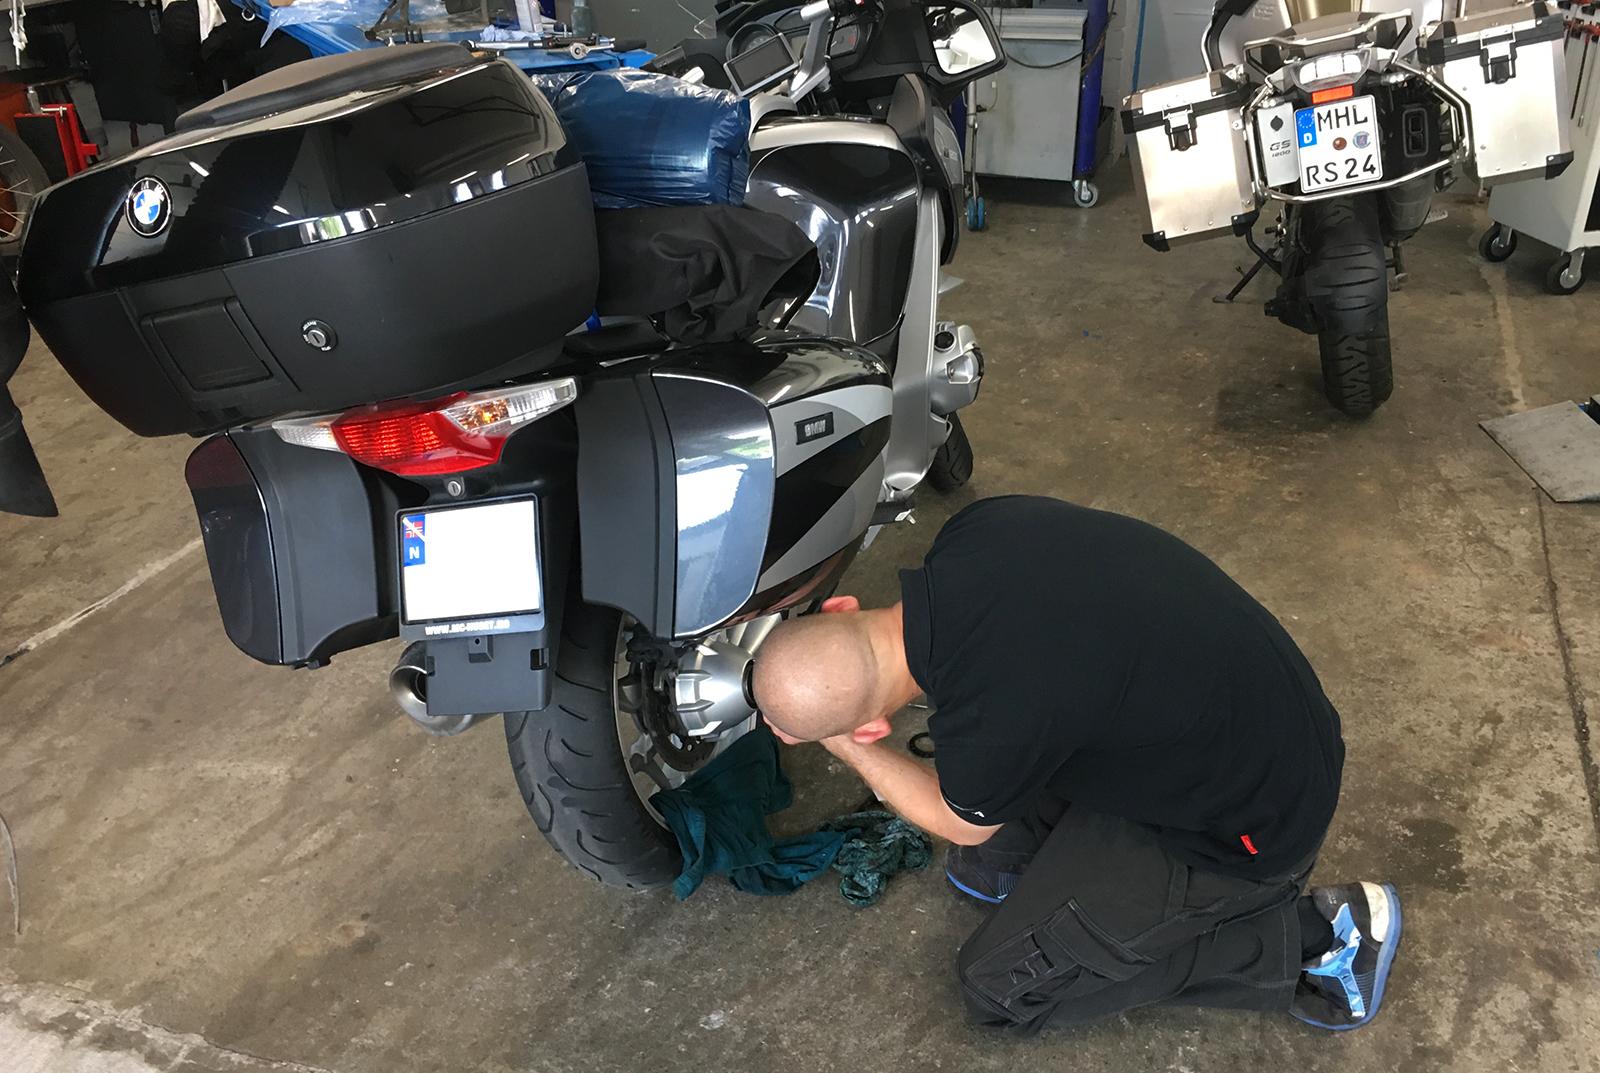 A skilled BMW technician analyzing the problem